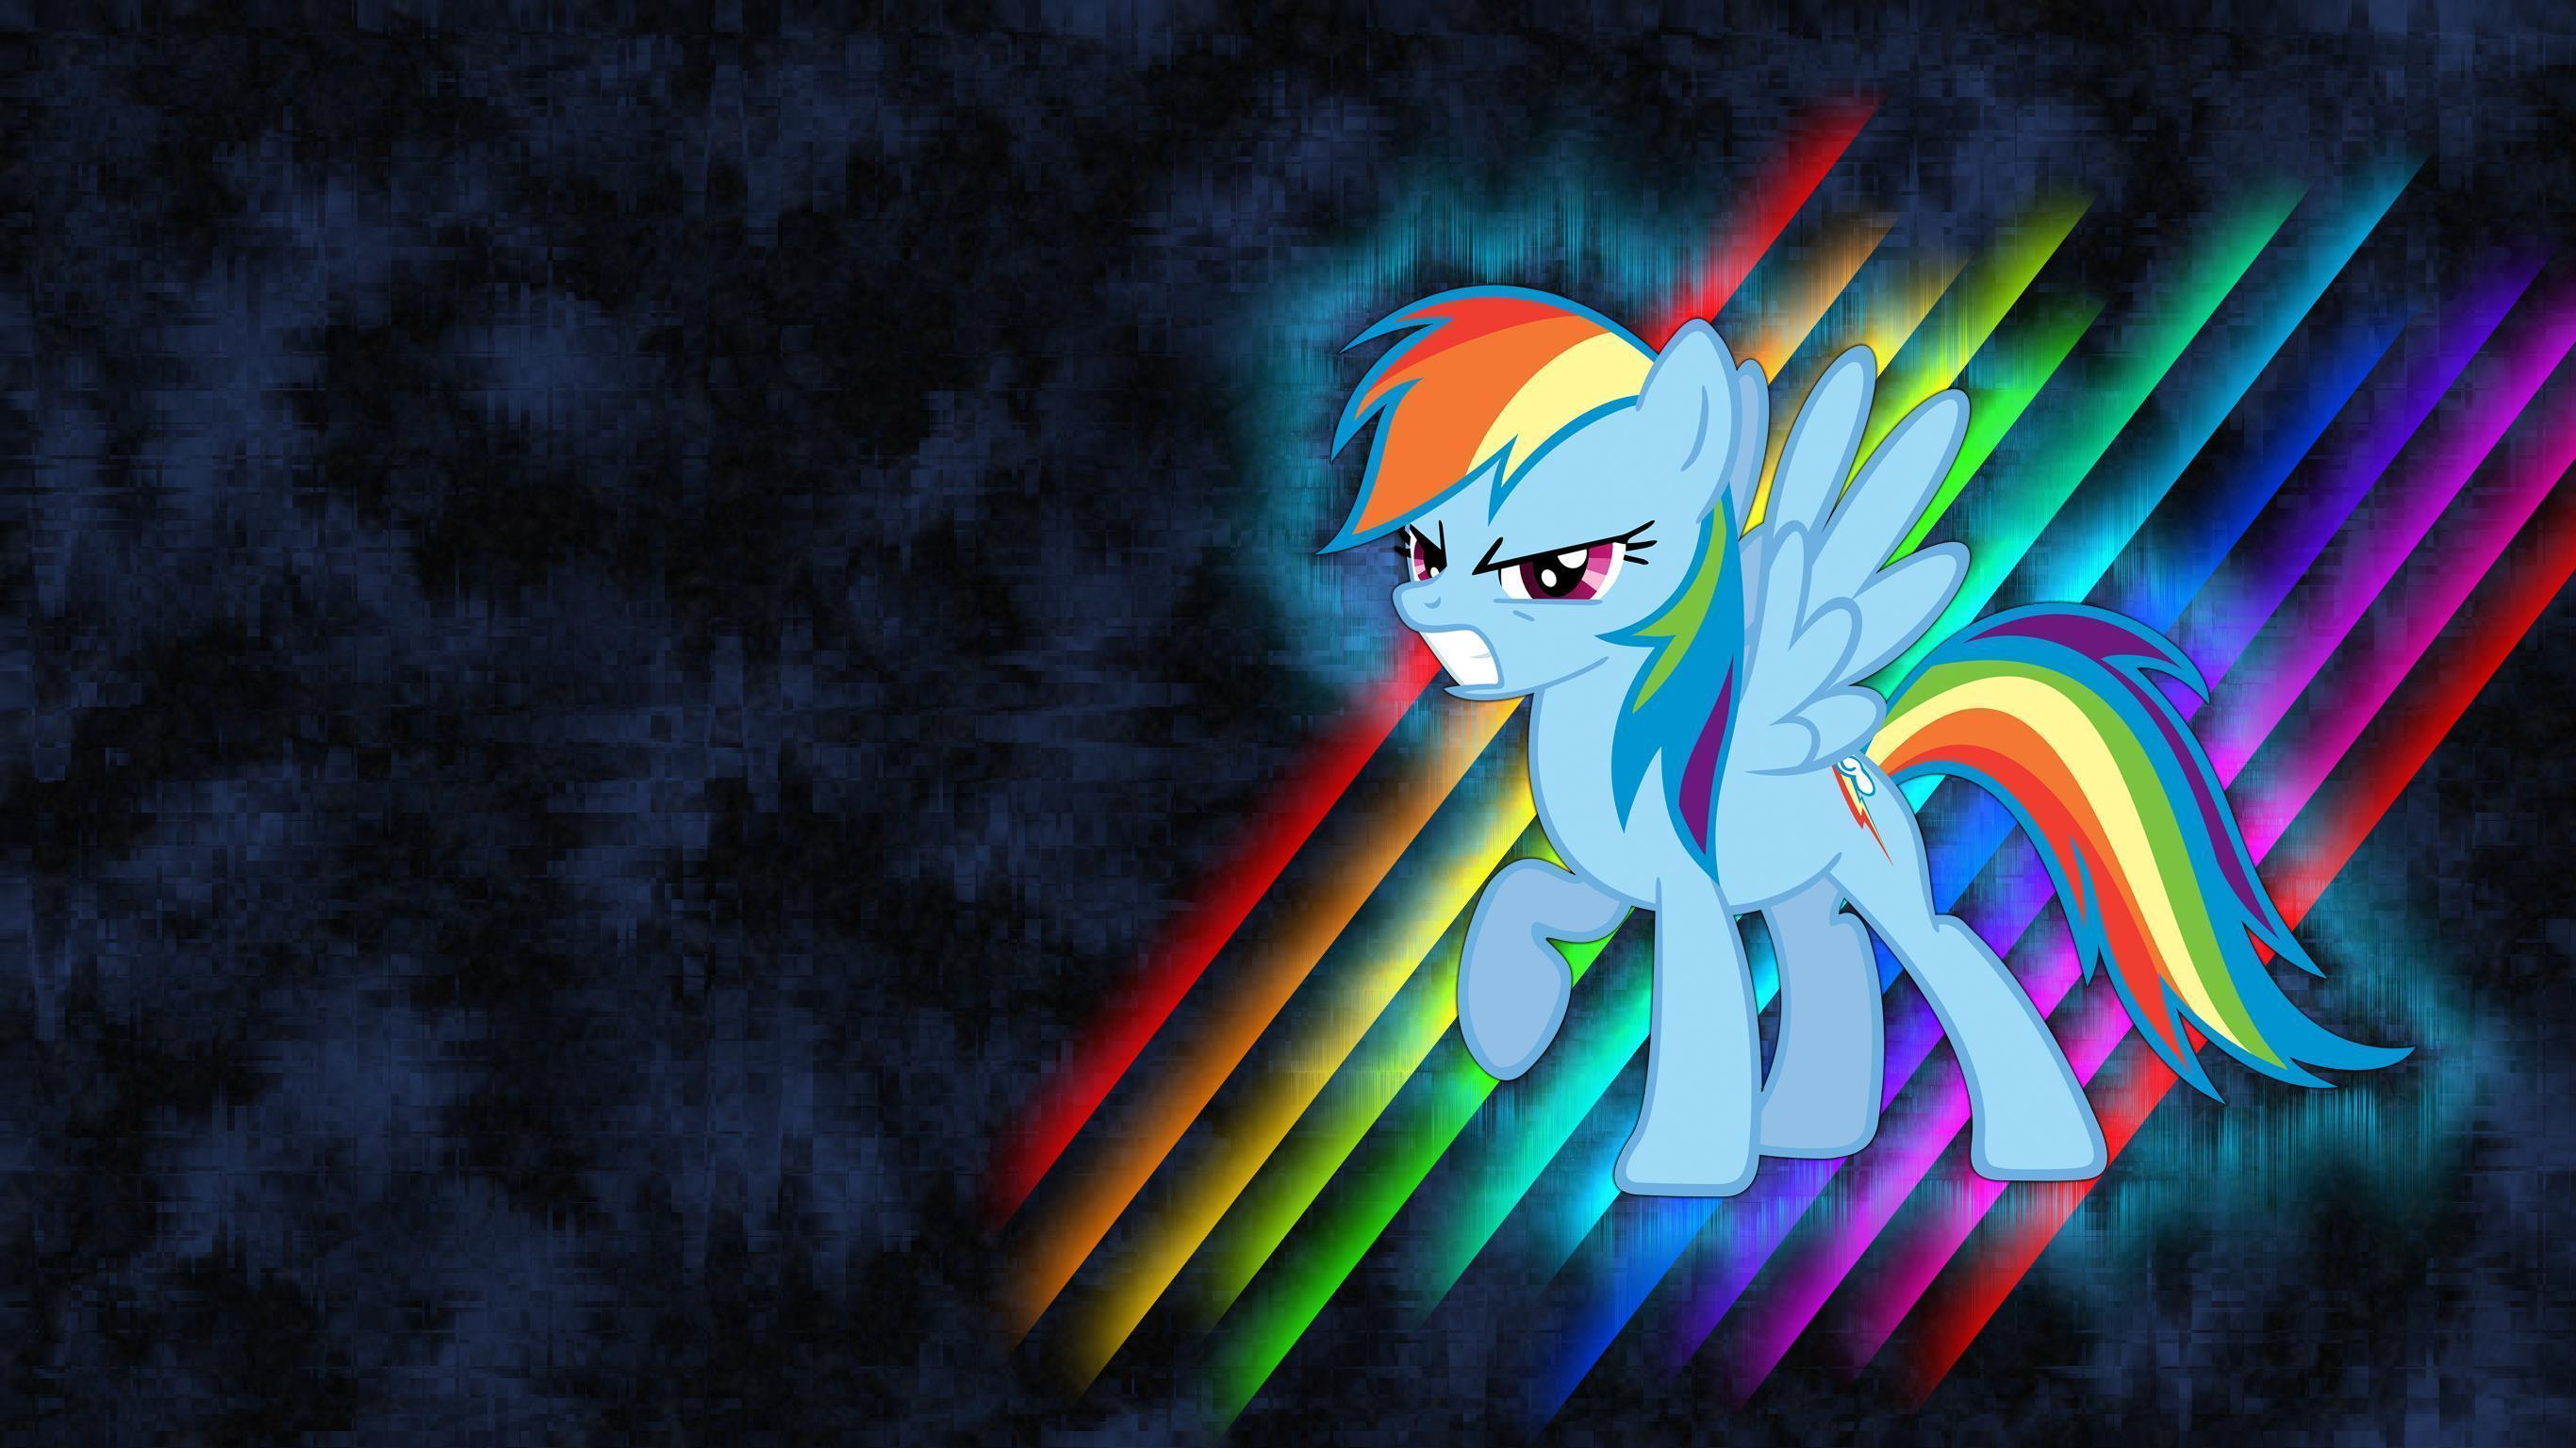 Rainbow Dash Wallpapers - Wallpaper Cave